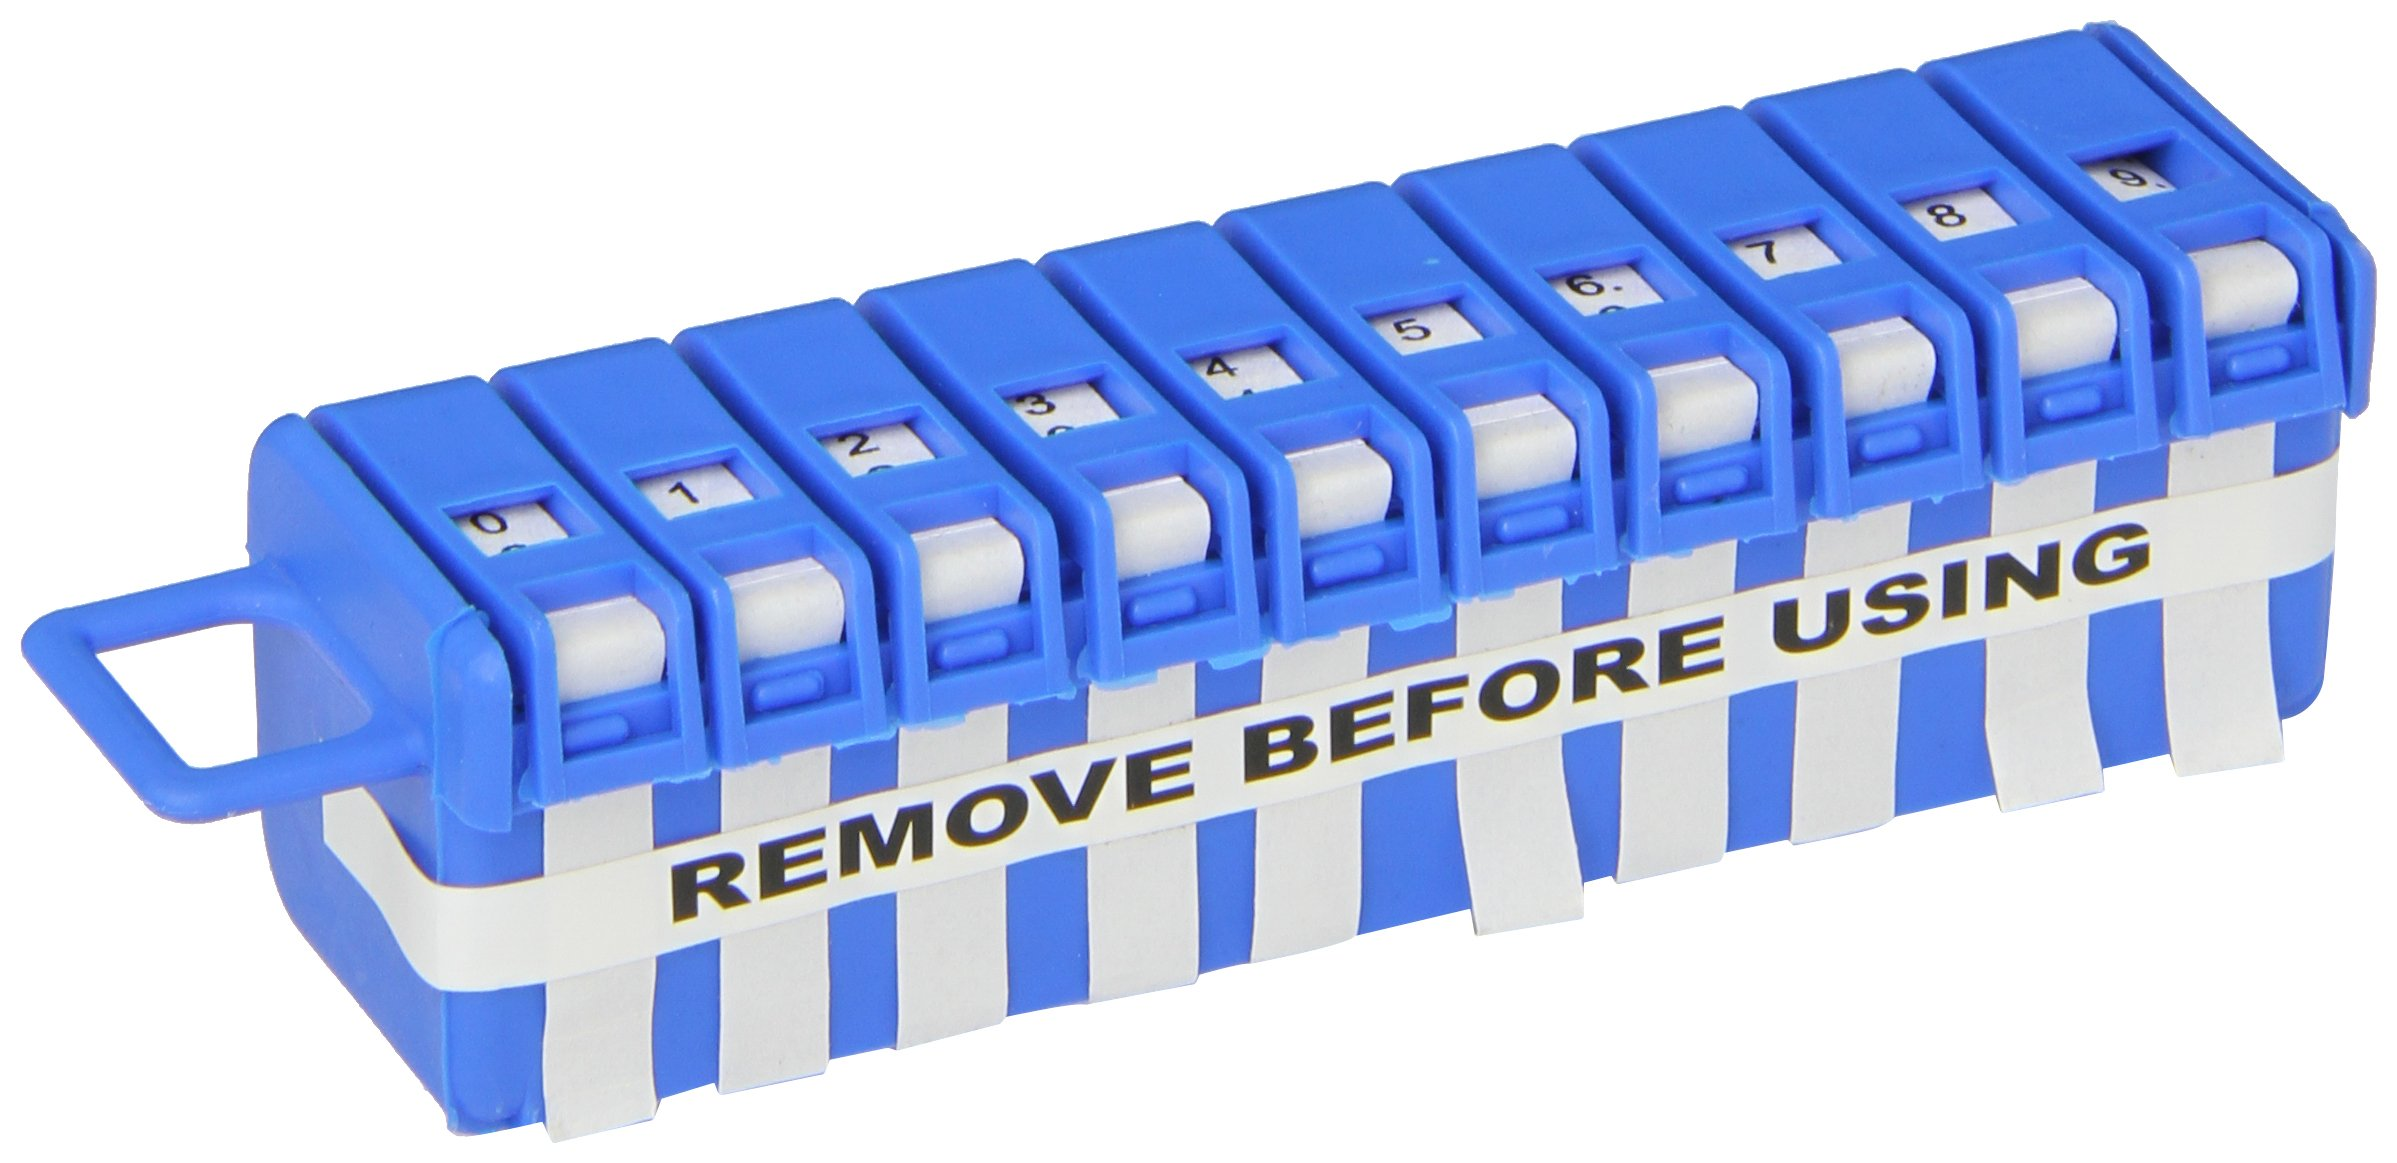 Hellermann Tyton WMTD0-9 Wire Marker Tape Dispenser And Labels, 0-9, White